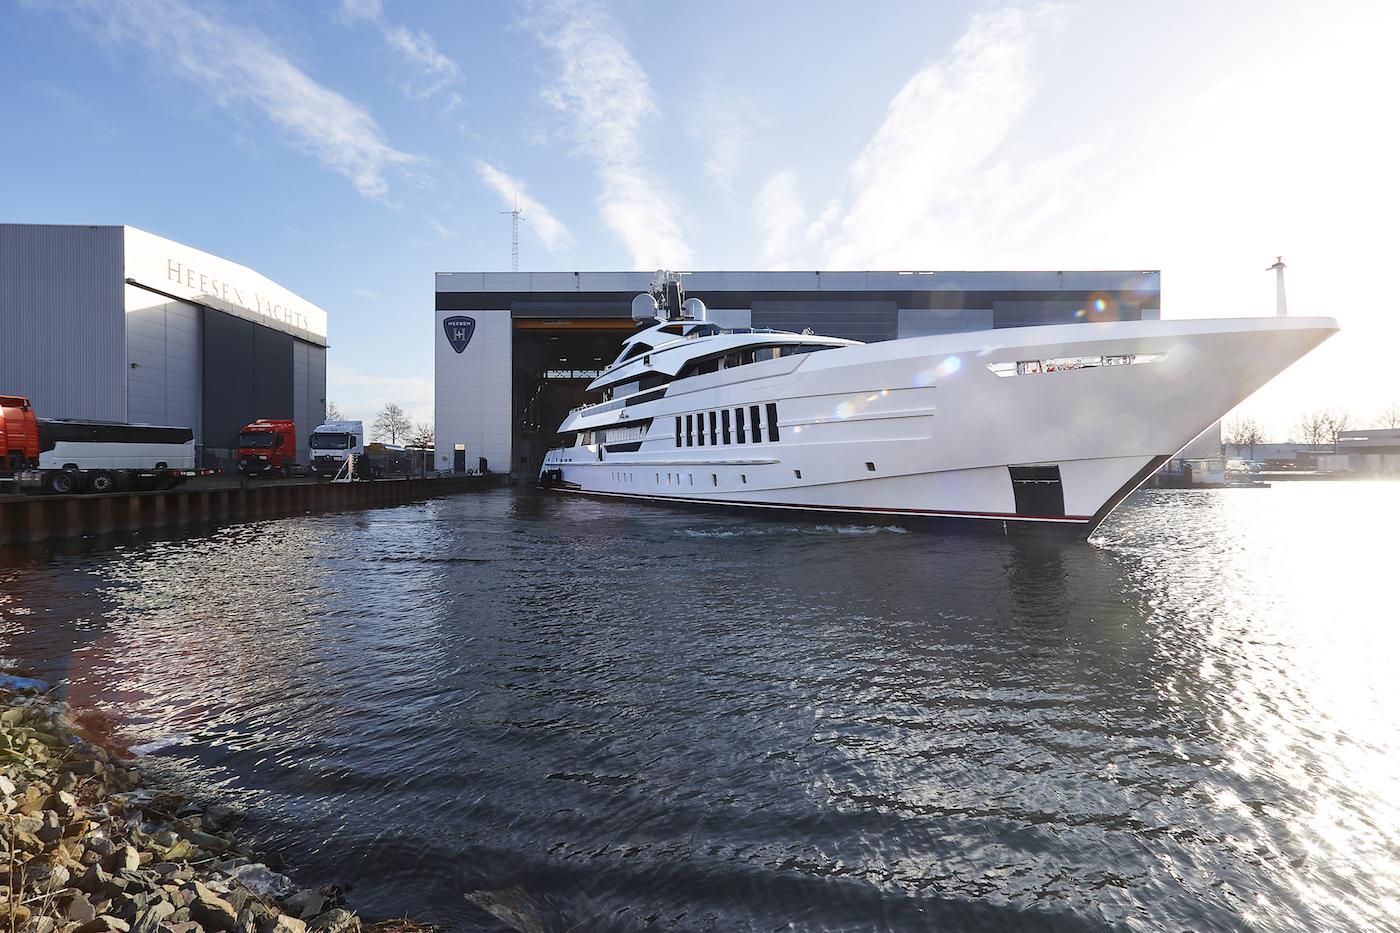 Heesen yachts motor yacht VIDA